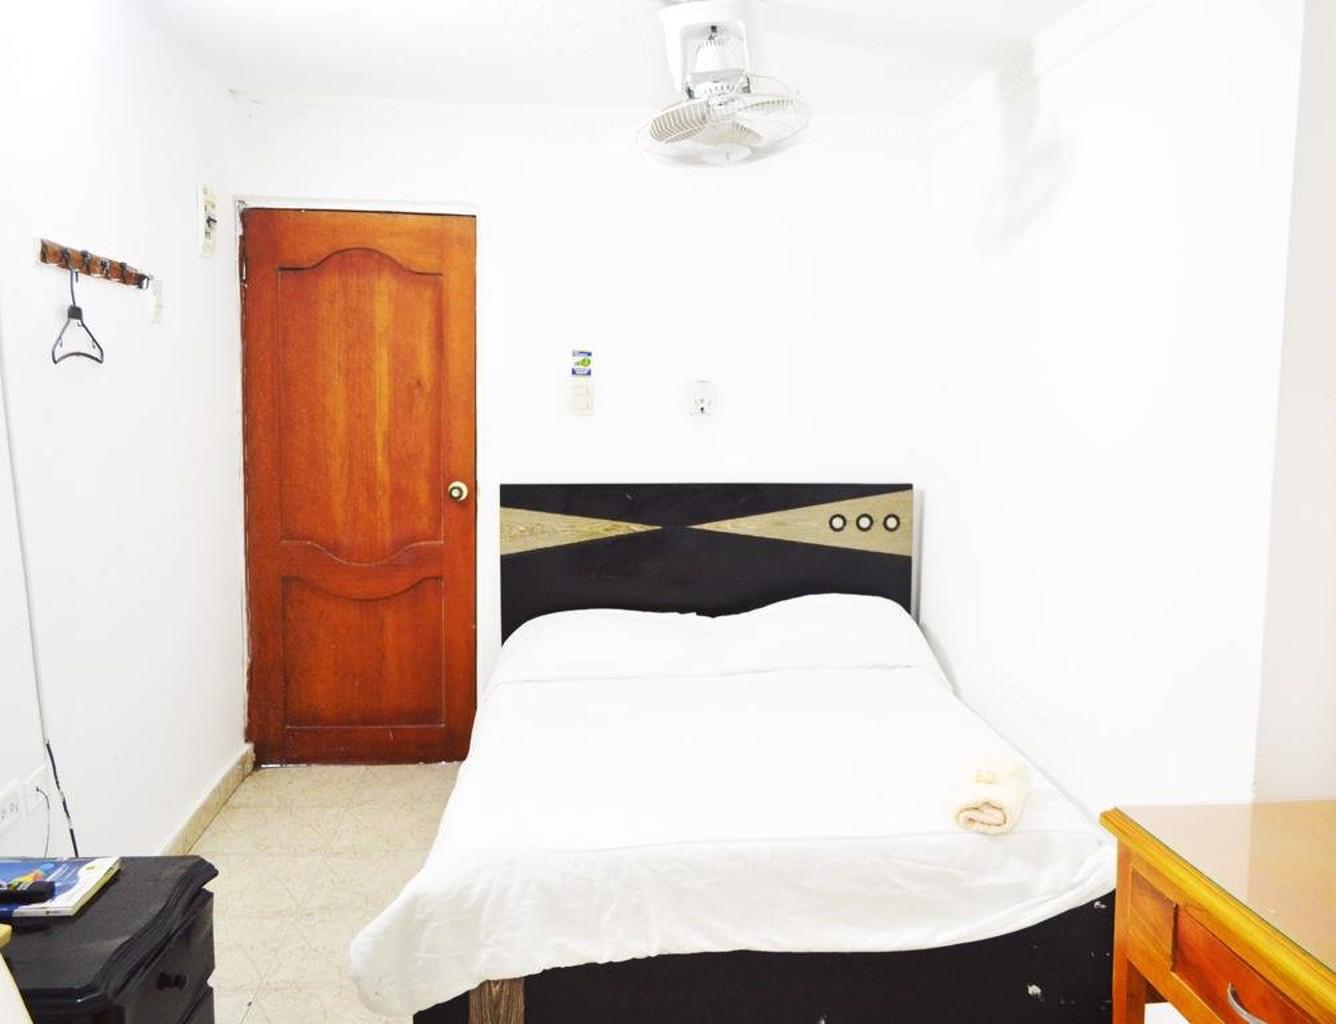 Gallery image of Hotel Interamericano